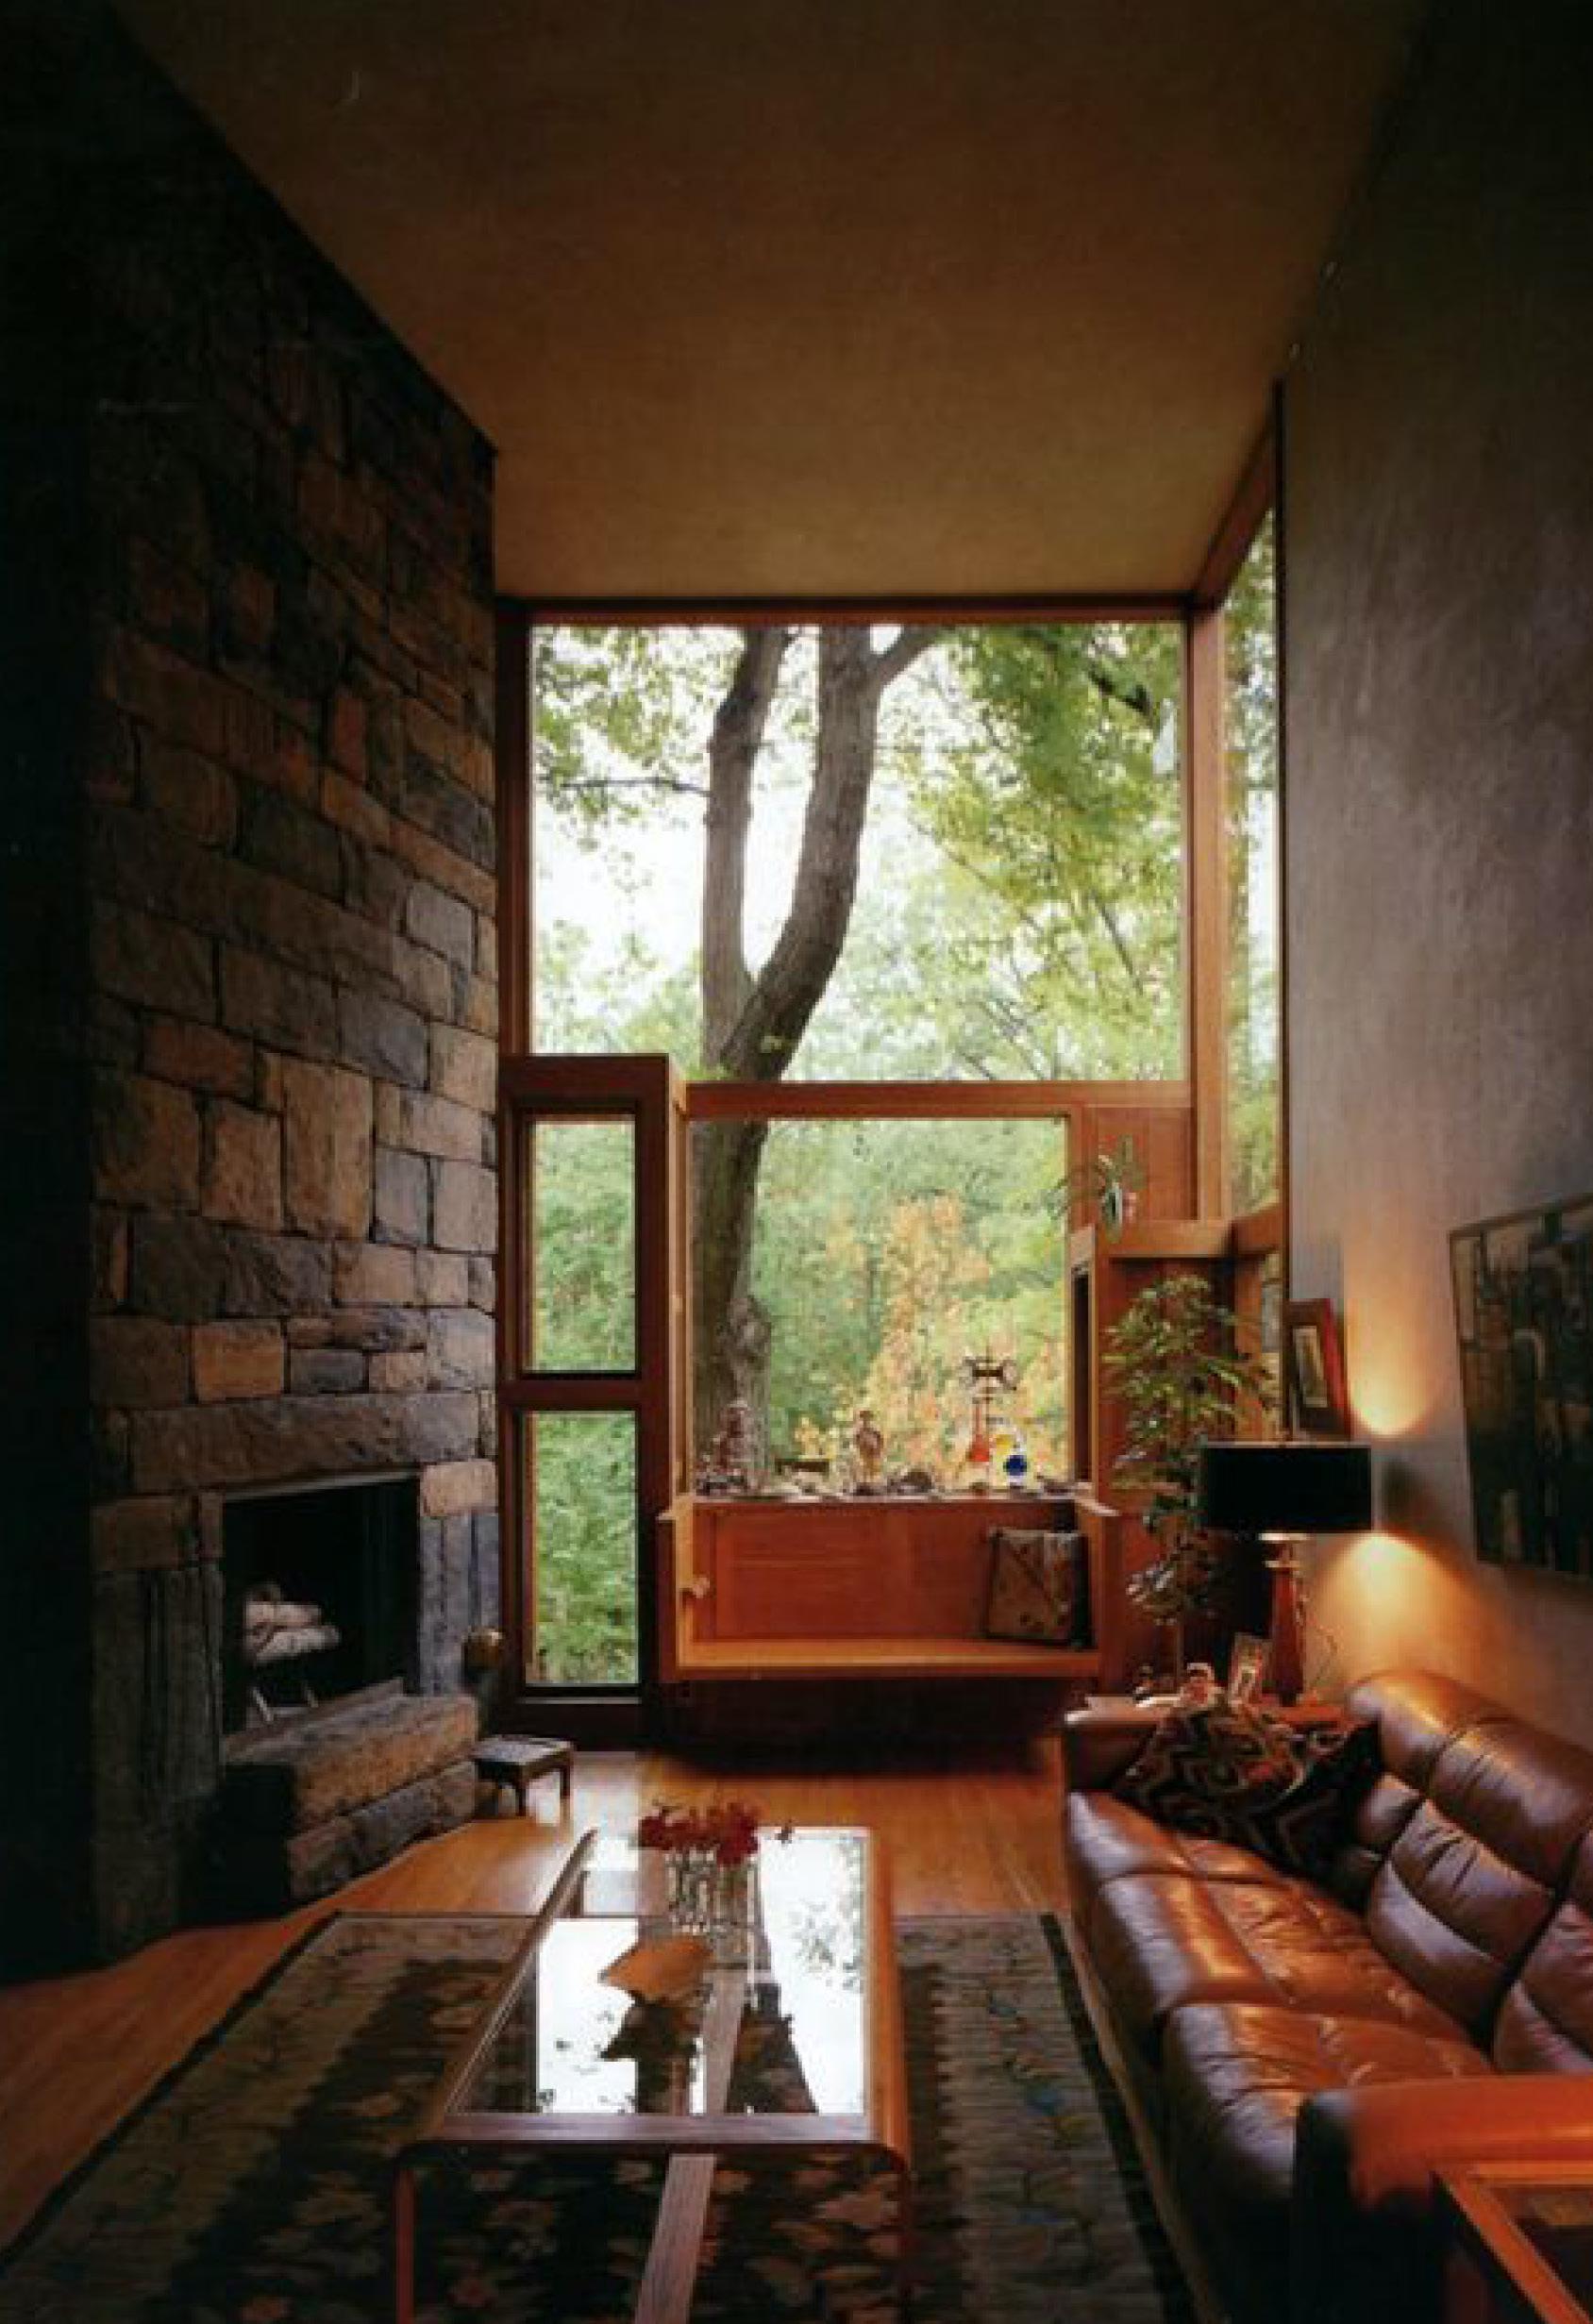 warm interior decoration